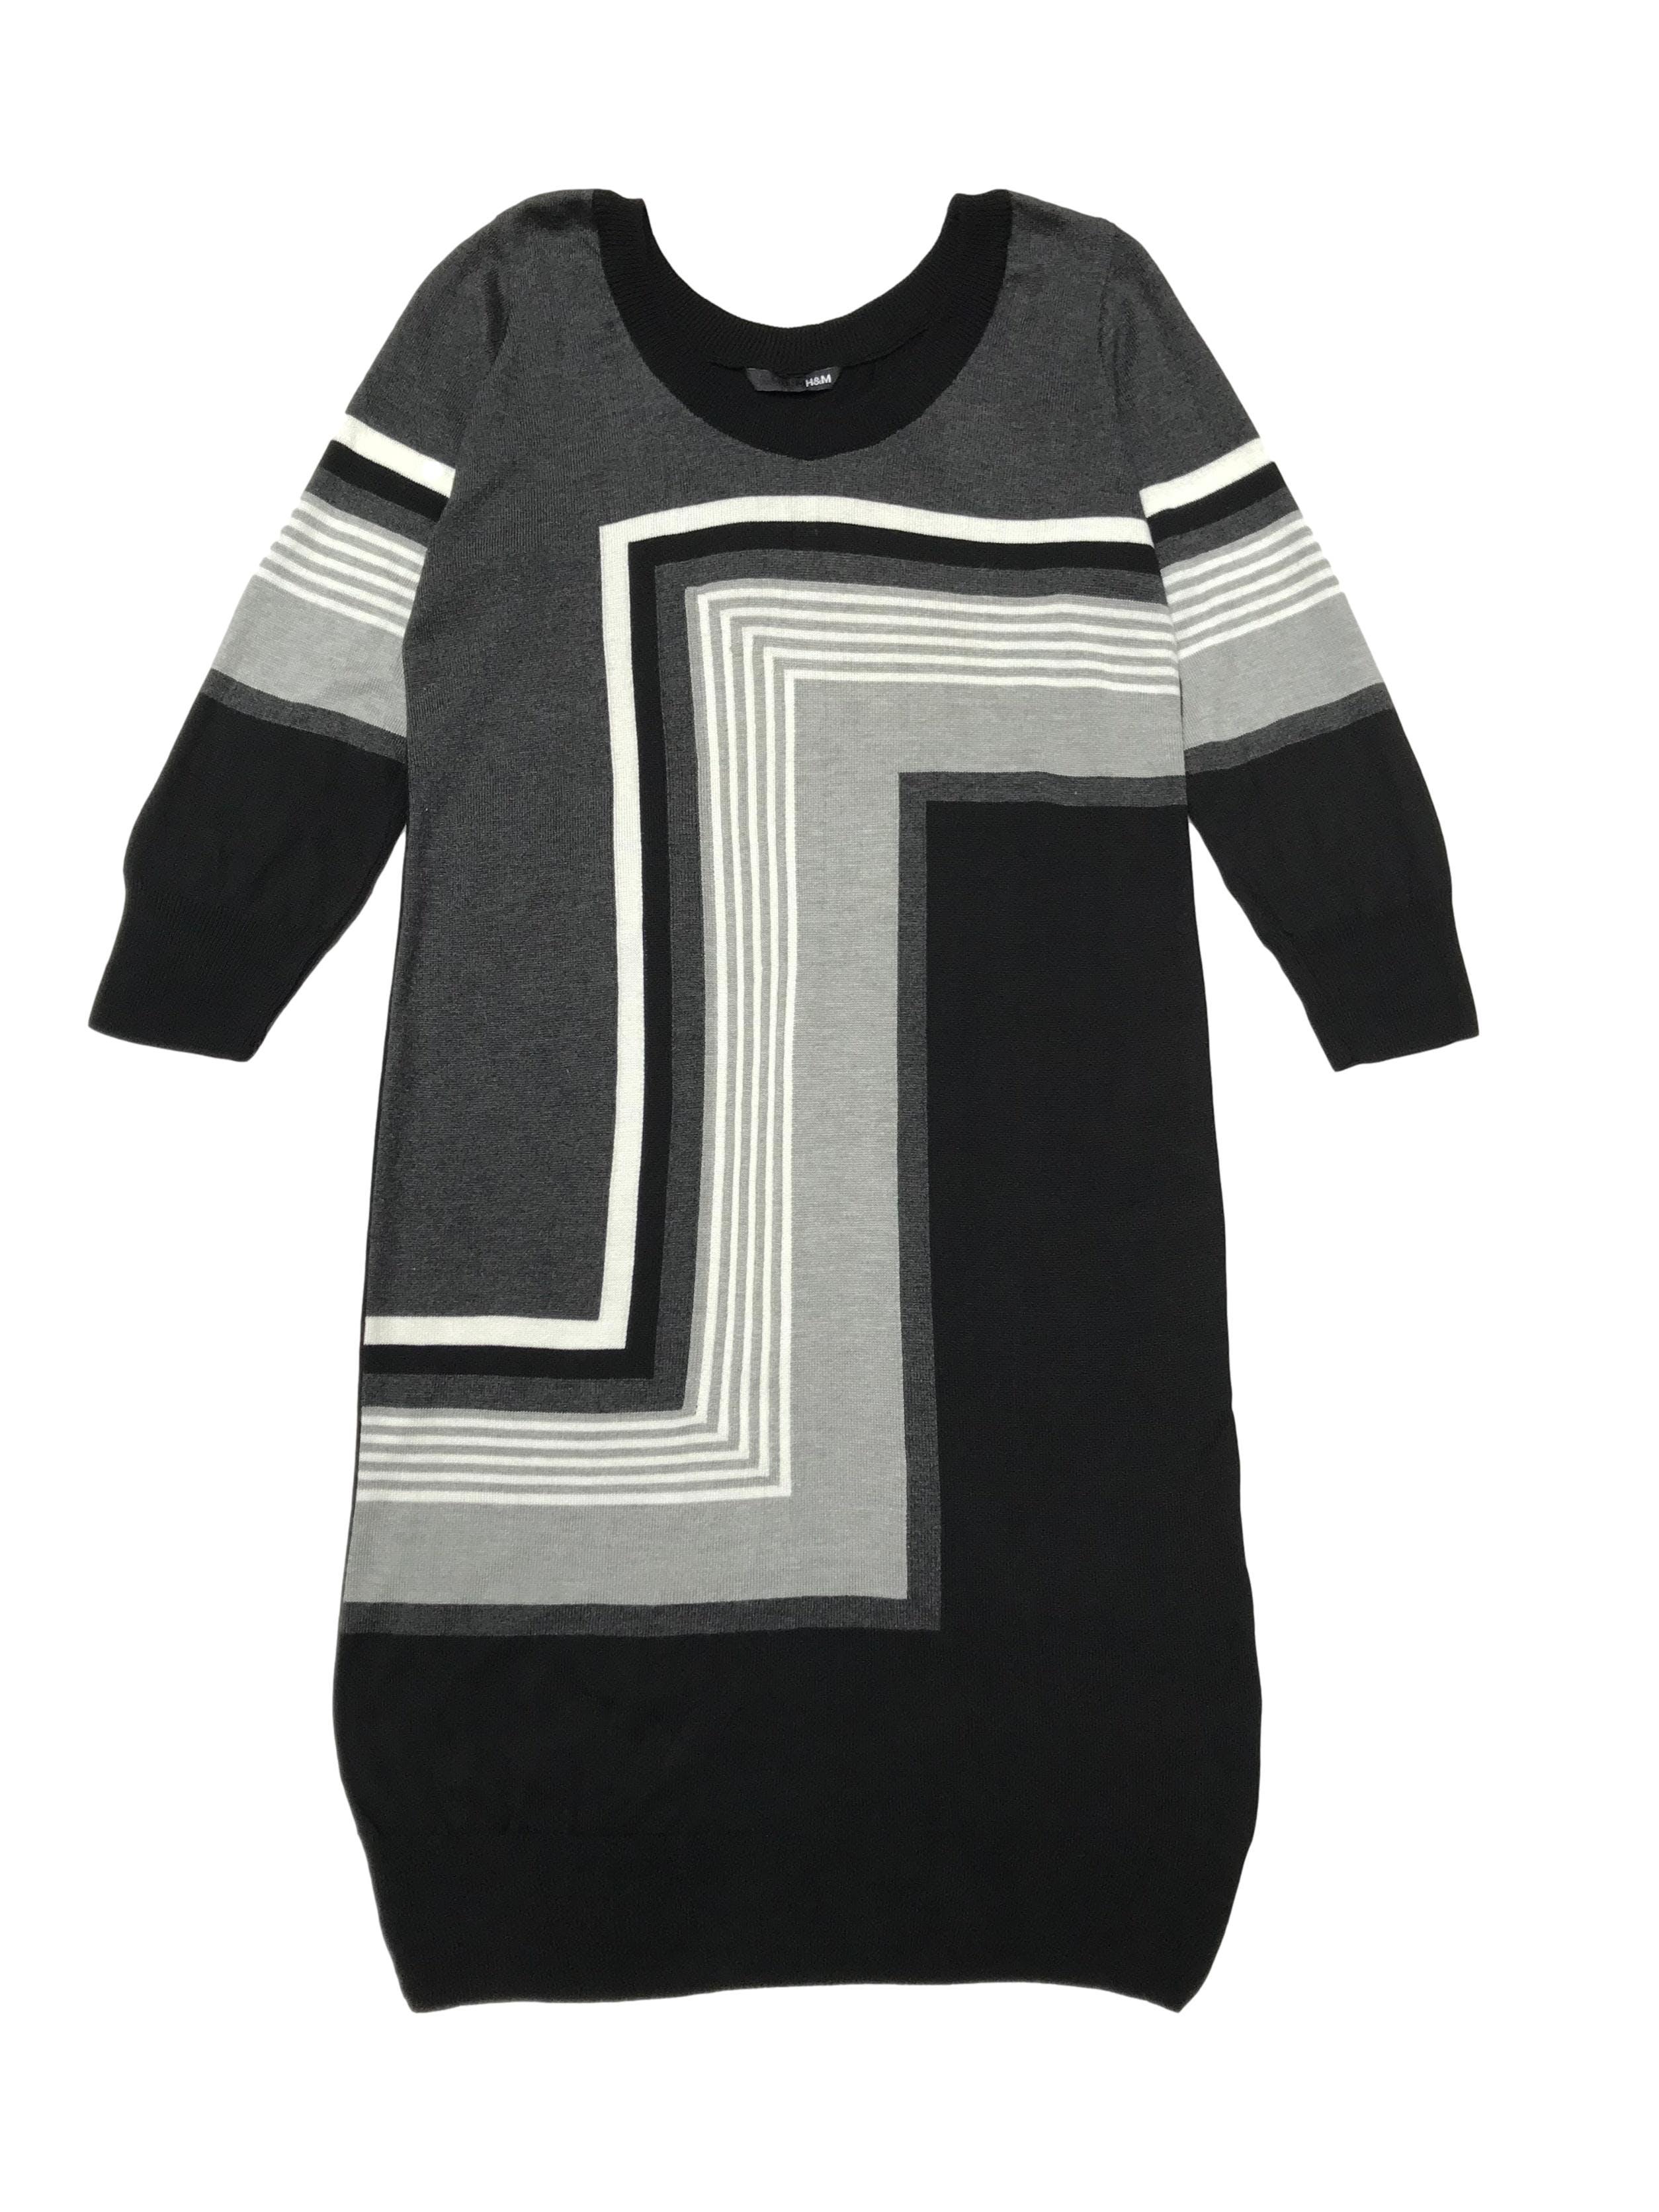 Vestido H&M de punto, negro con diseño geométrico, manga 3/4. Largo 90cm